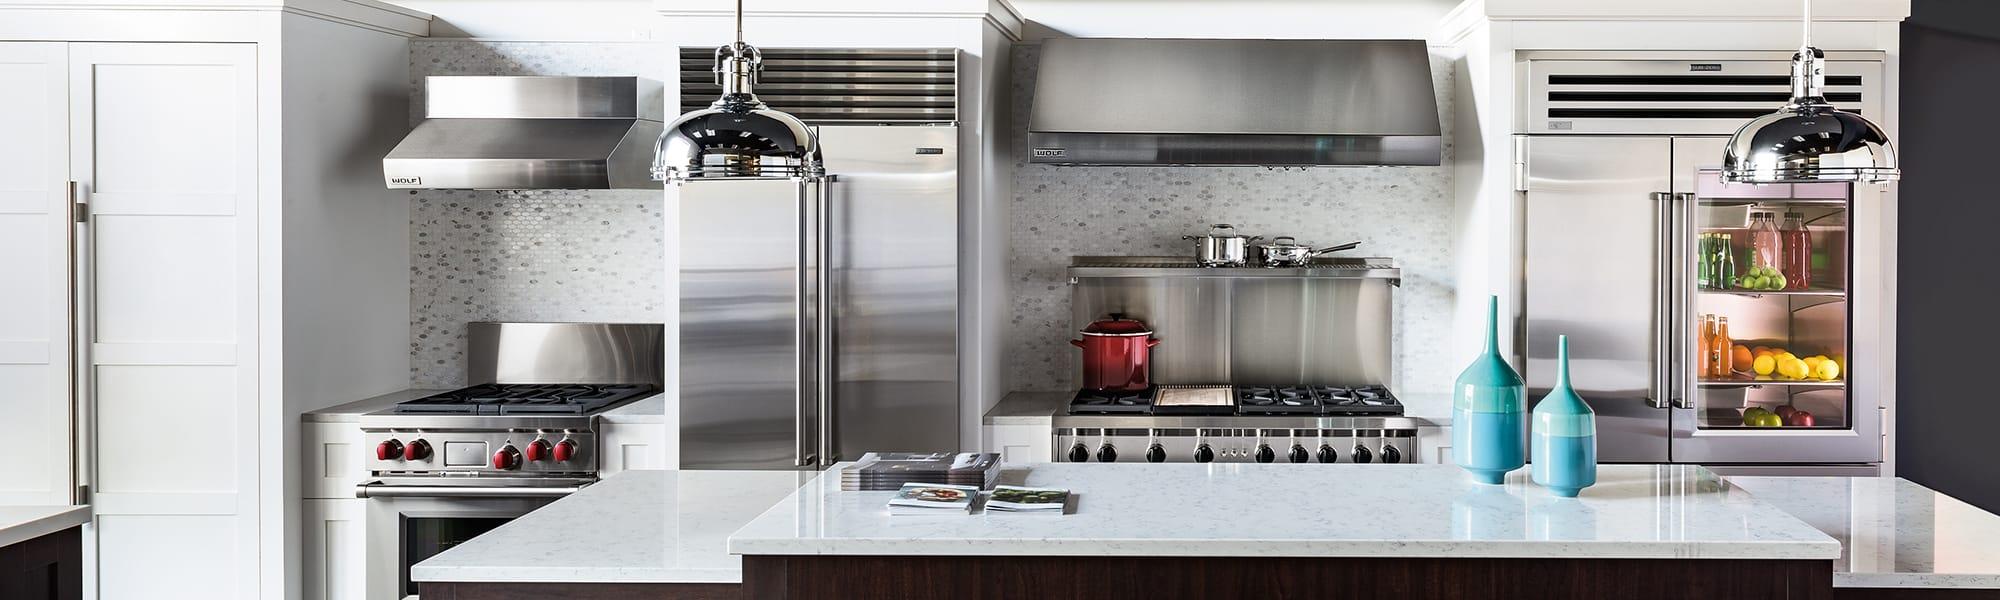 Sub Zero Wolf Living Kitchen